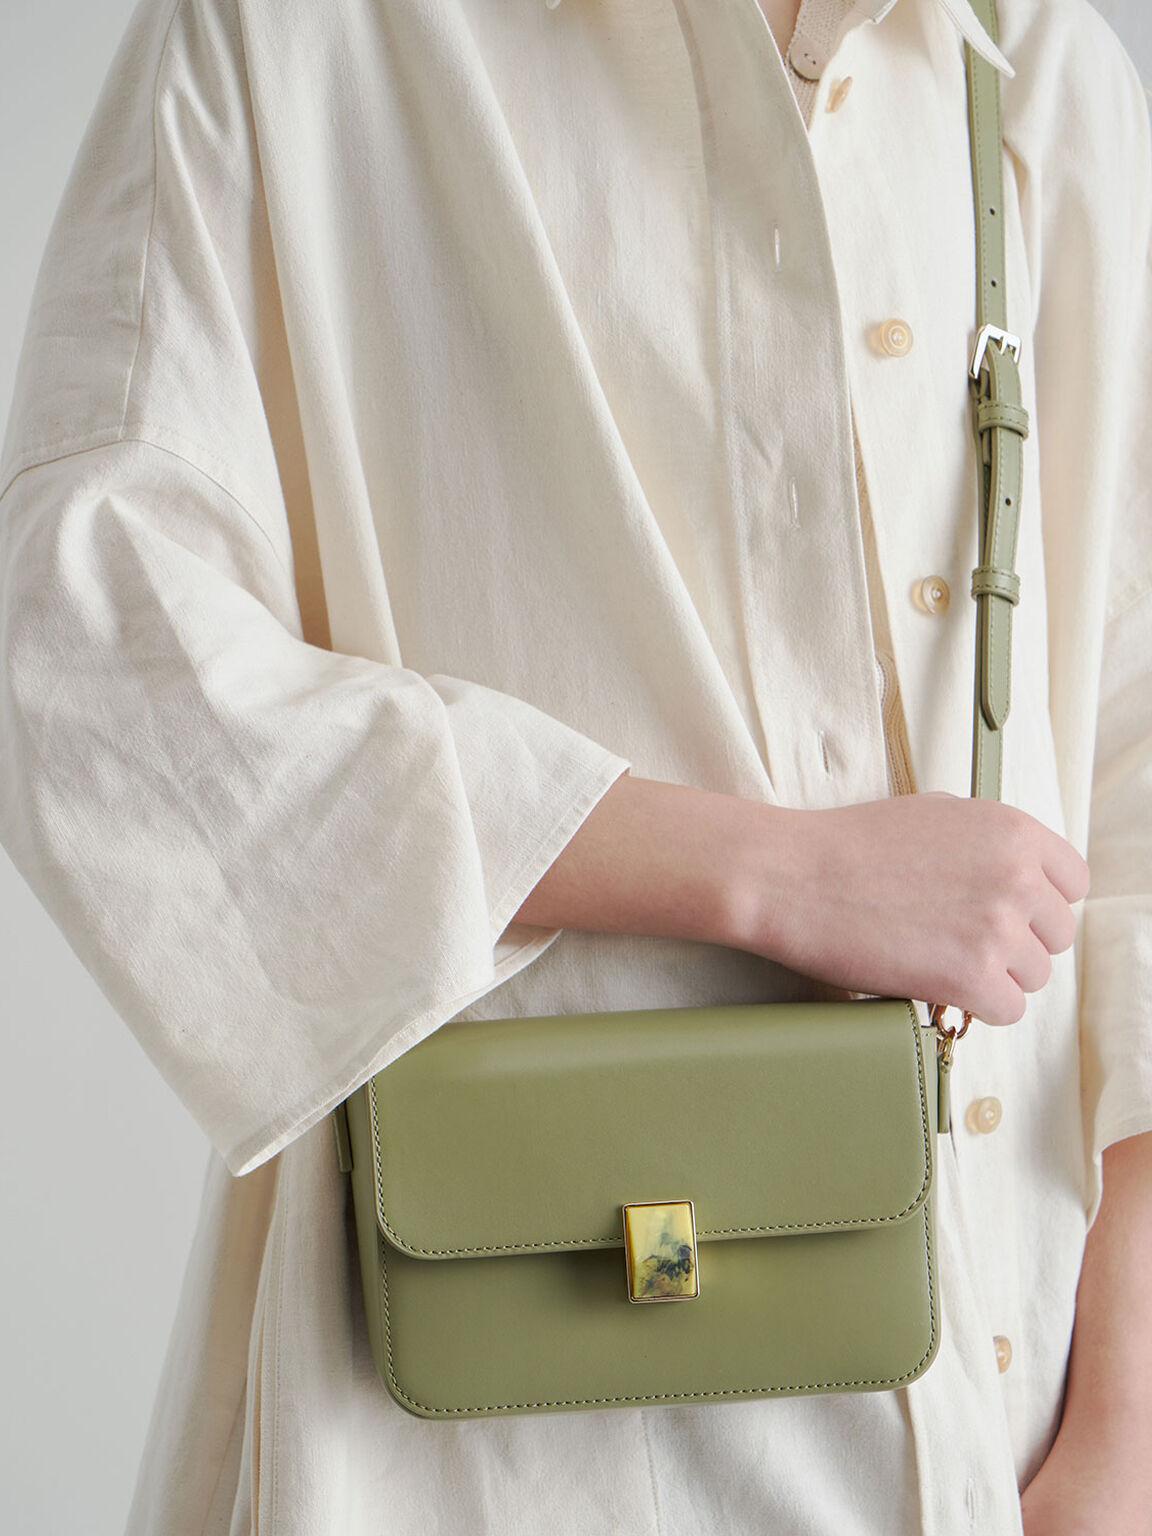 Leather Embellished Push-Lock Crossbody Bag, Sage Green, hi-res